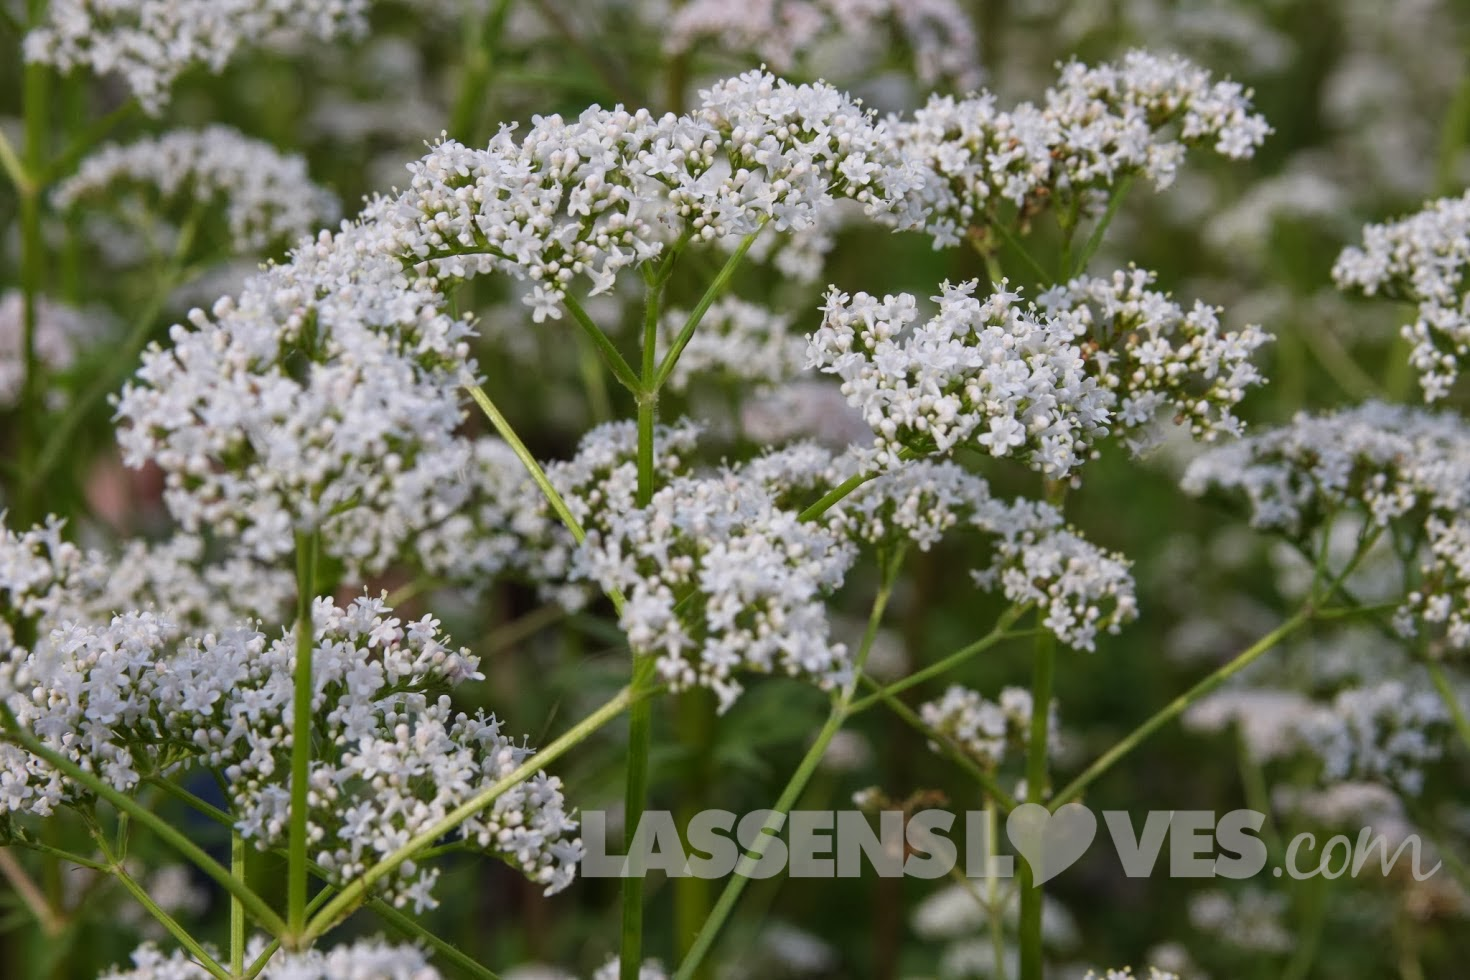 lassensloves.com, Lassen's, Lassens, Gaia+Herbs, Valerian+Flowers